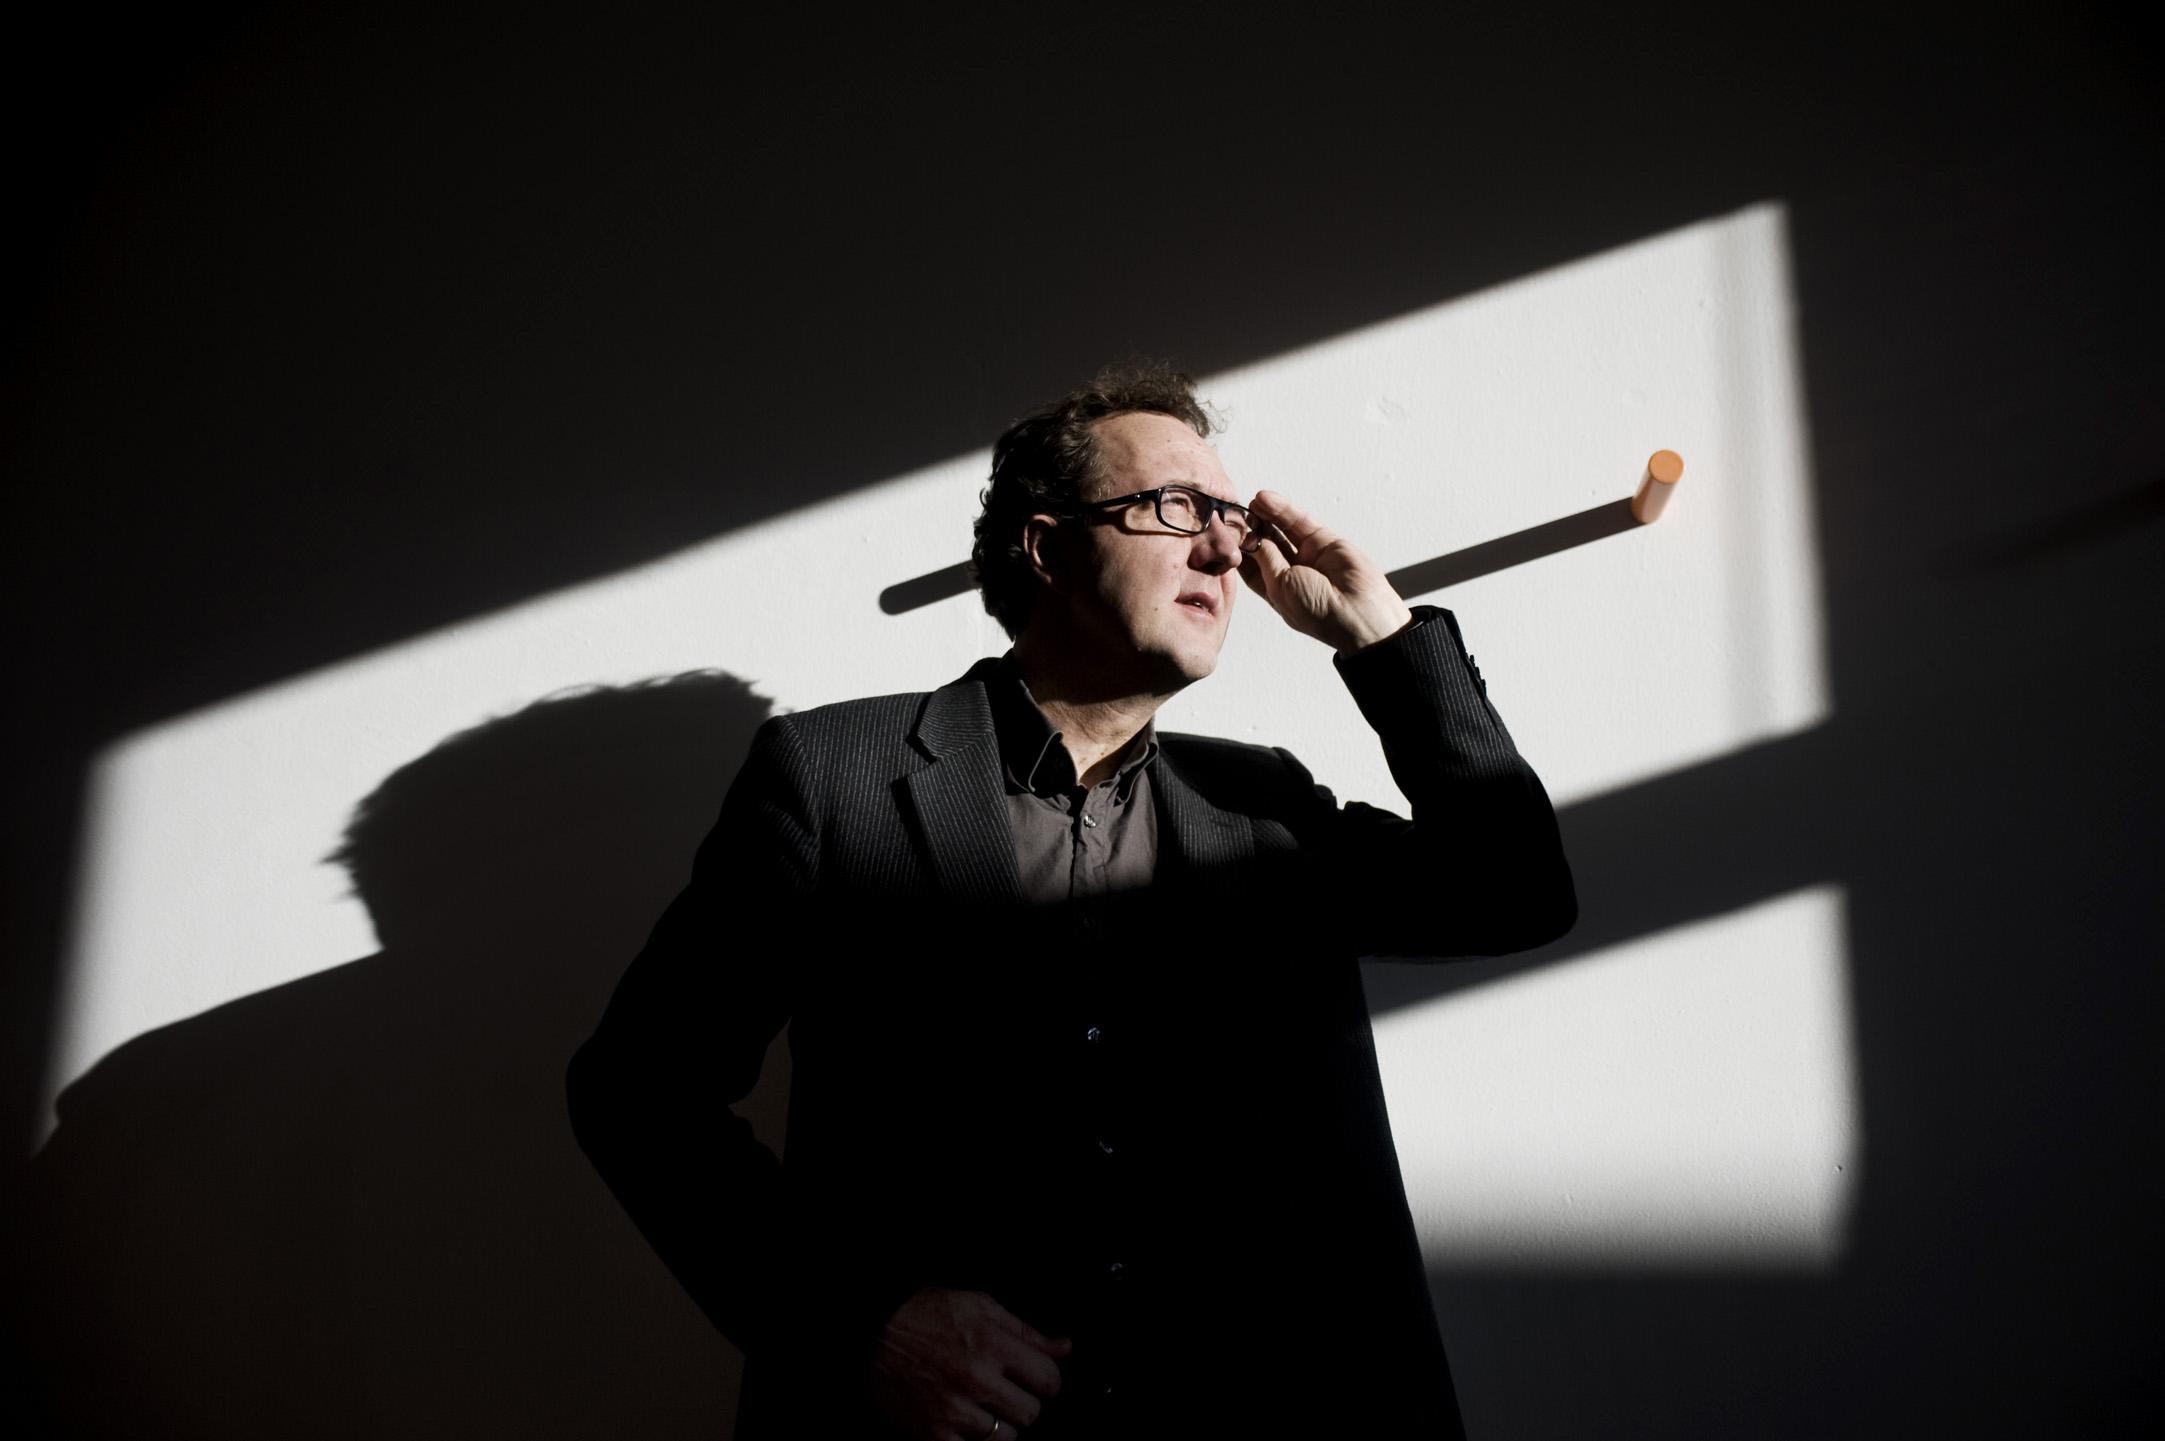 Mr. Jesper Kongshaug